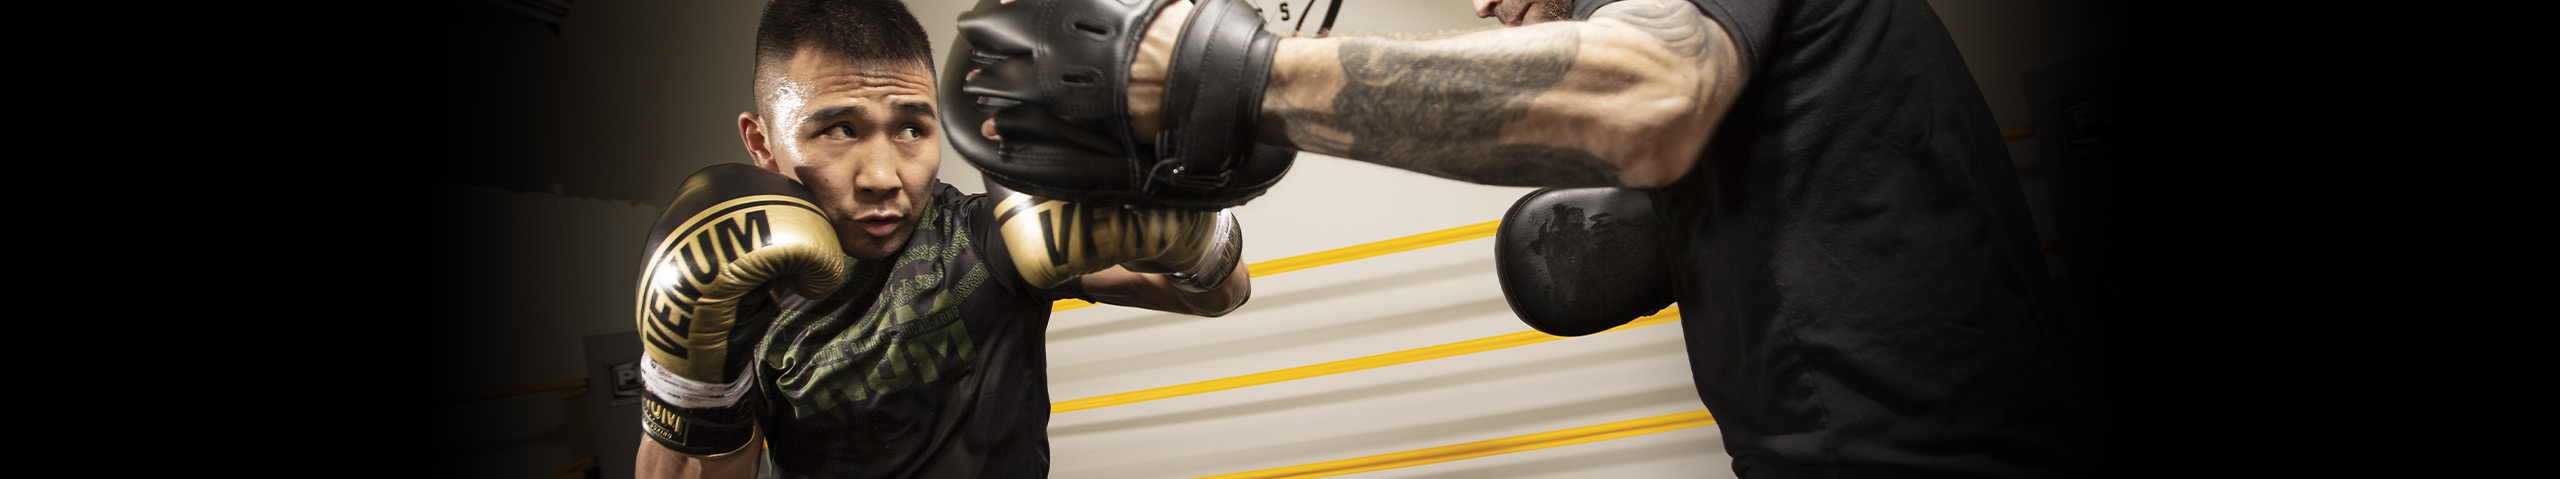 Venum Boxing Gear | Venum.com Asia